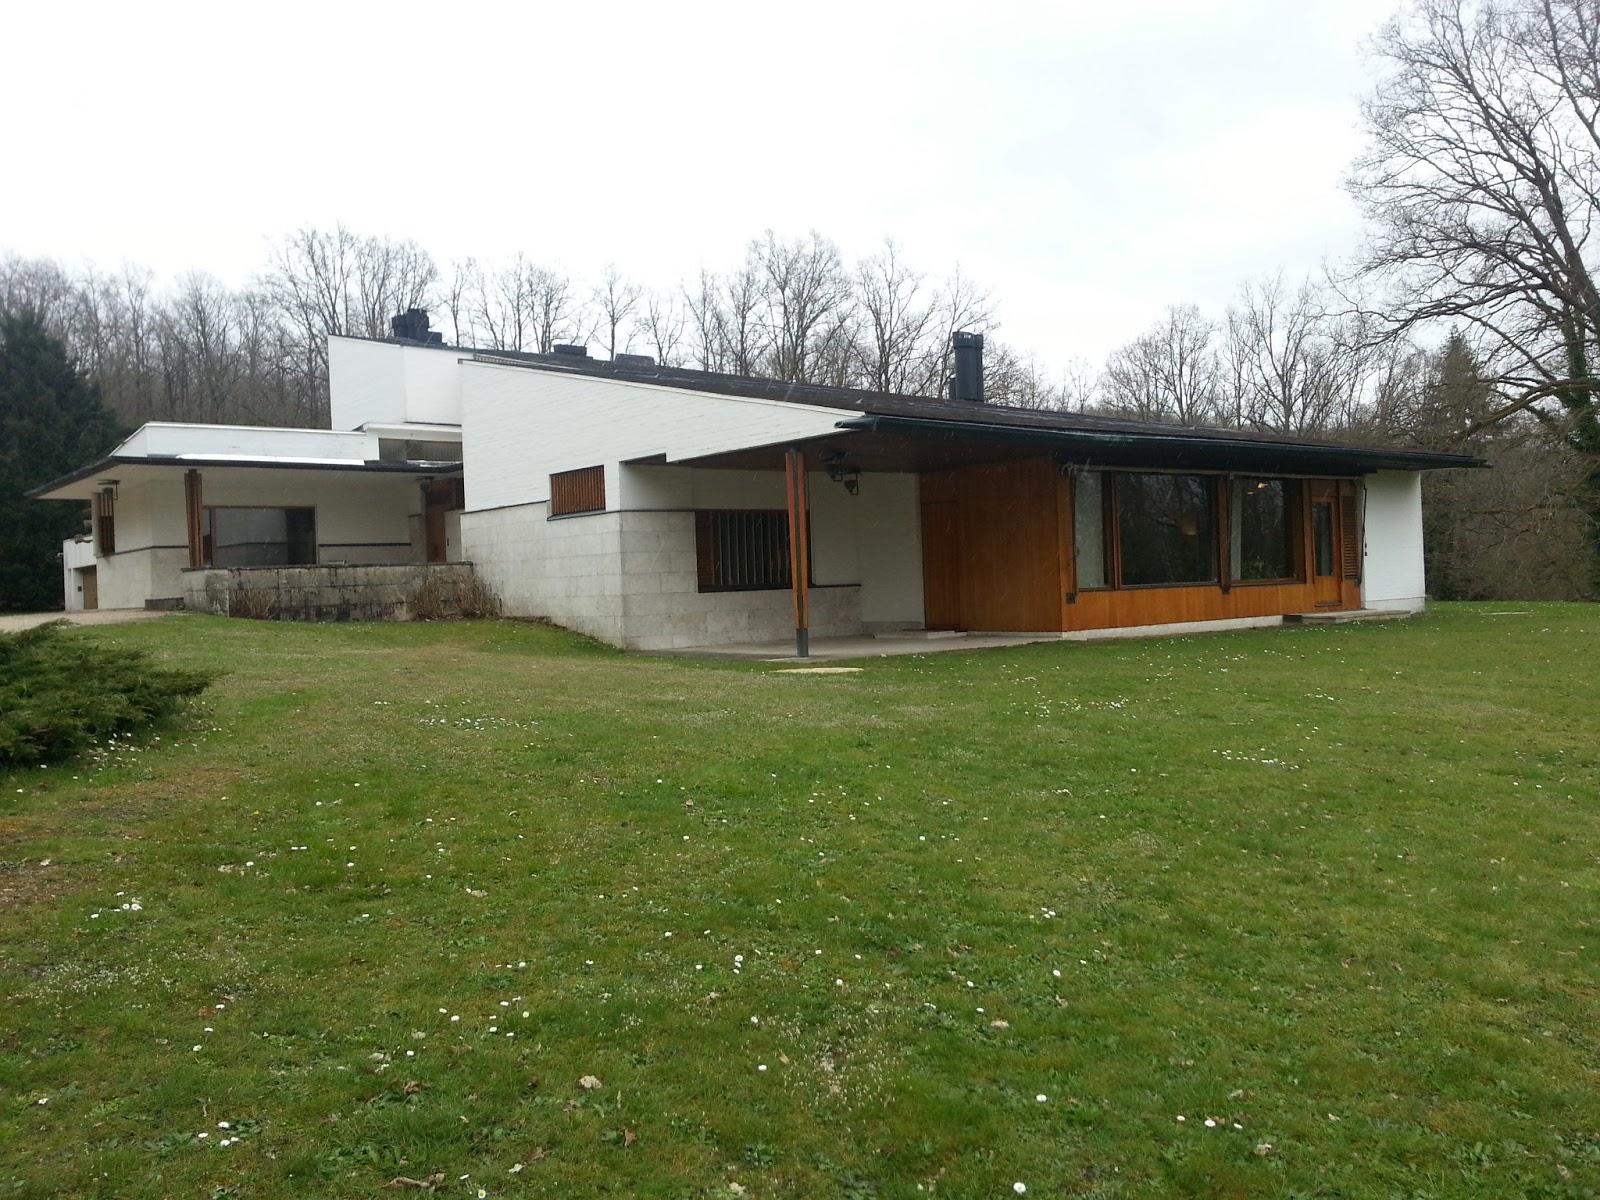 Alvar aalto 39 s maison louis carr 1956 ok for Alvar aalto maison